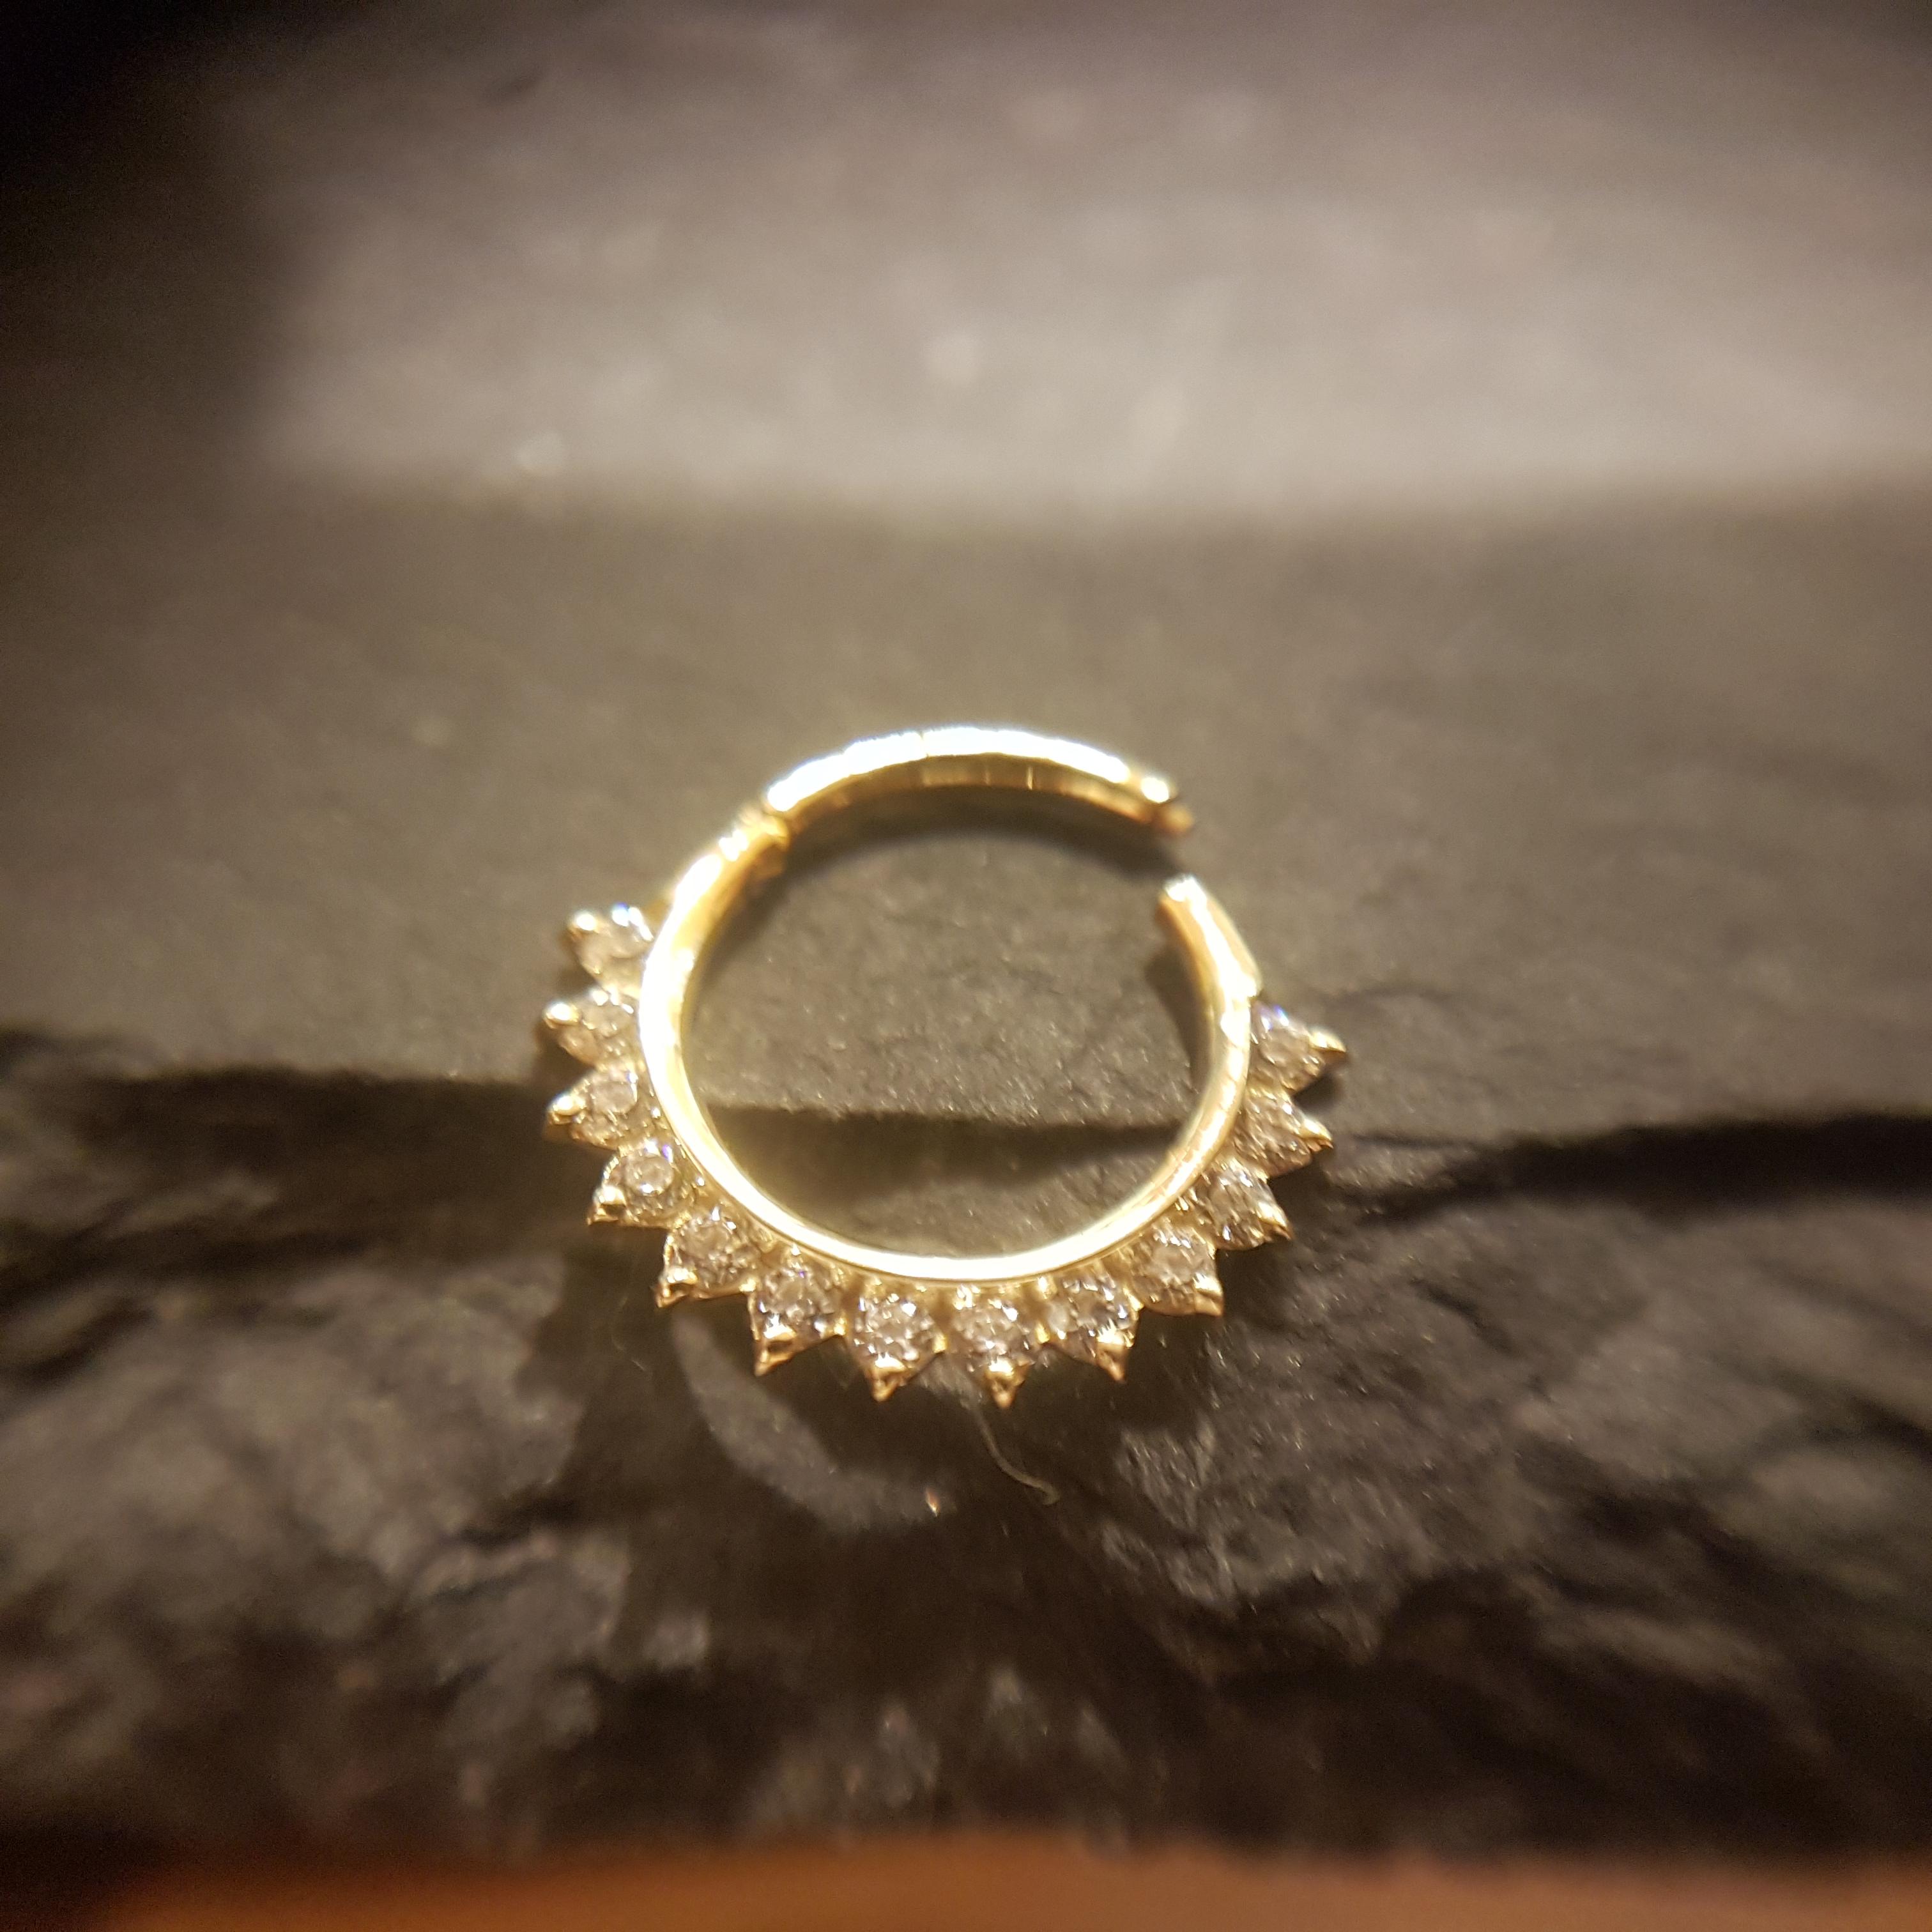 Auris 14k Echtgold Tiara Clicker Ring gelbgold